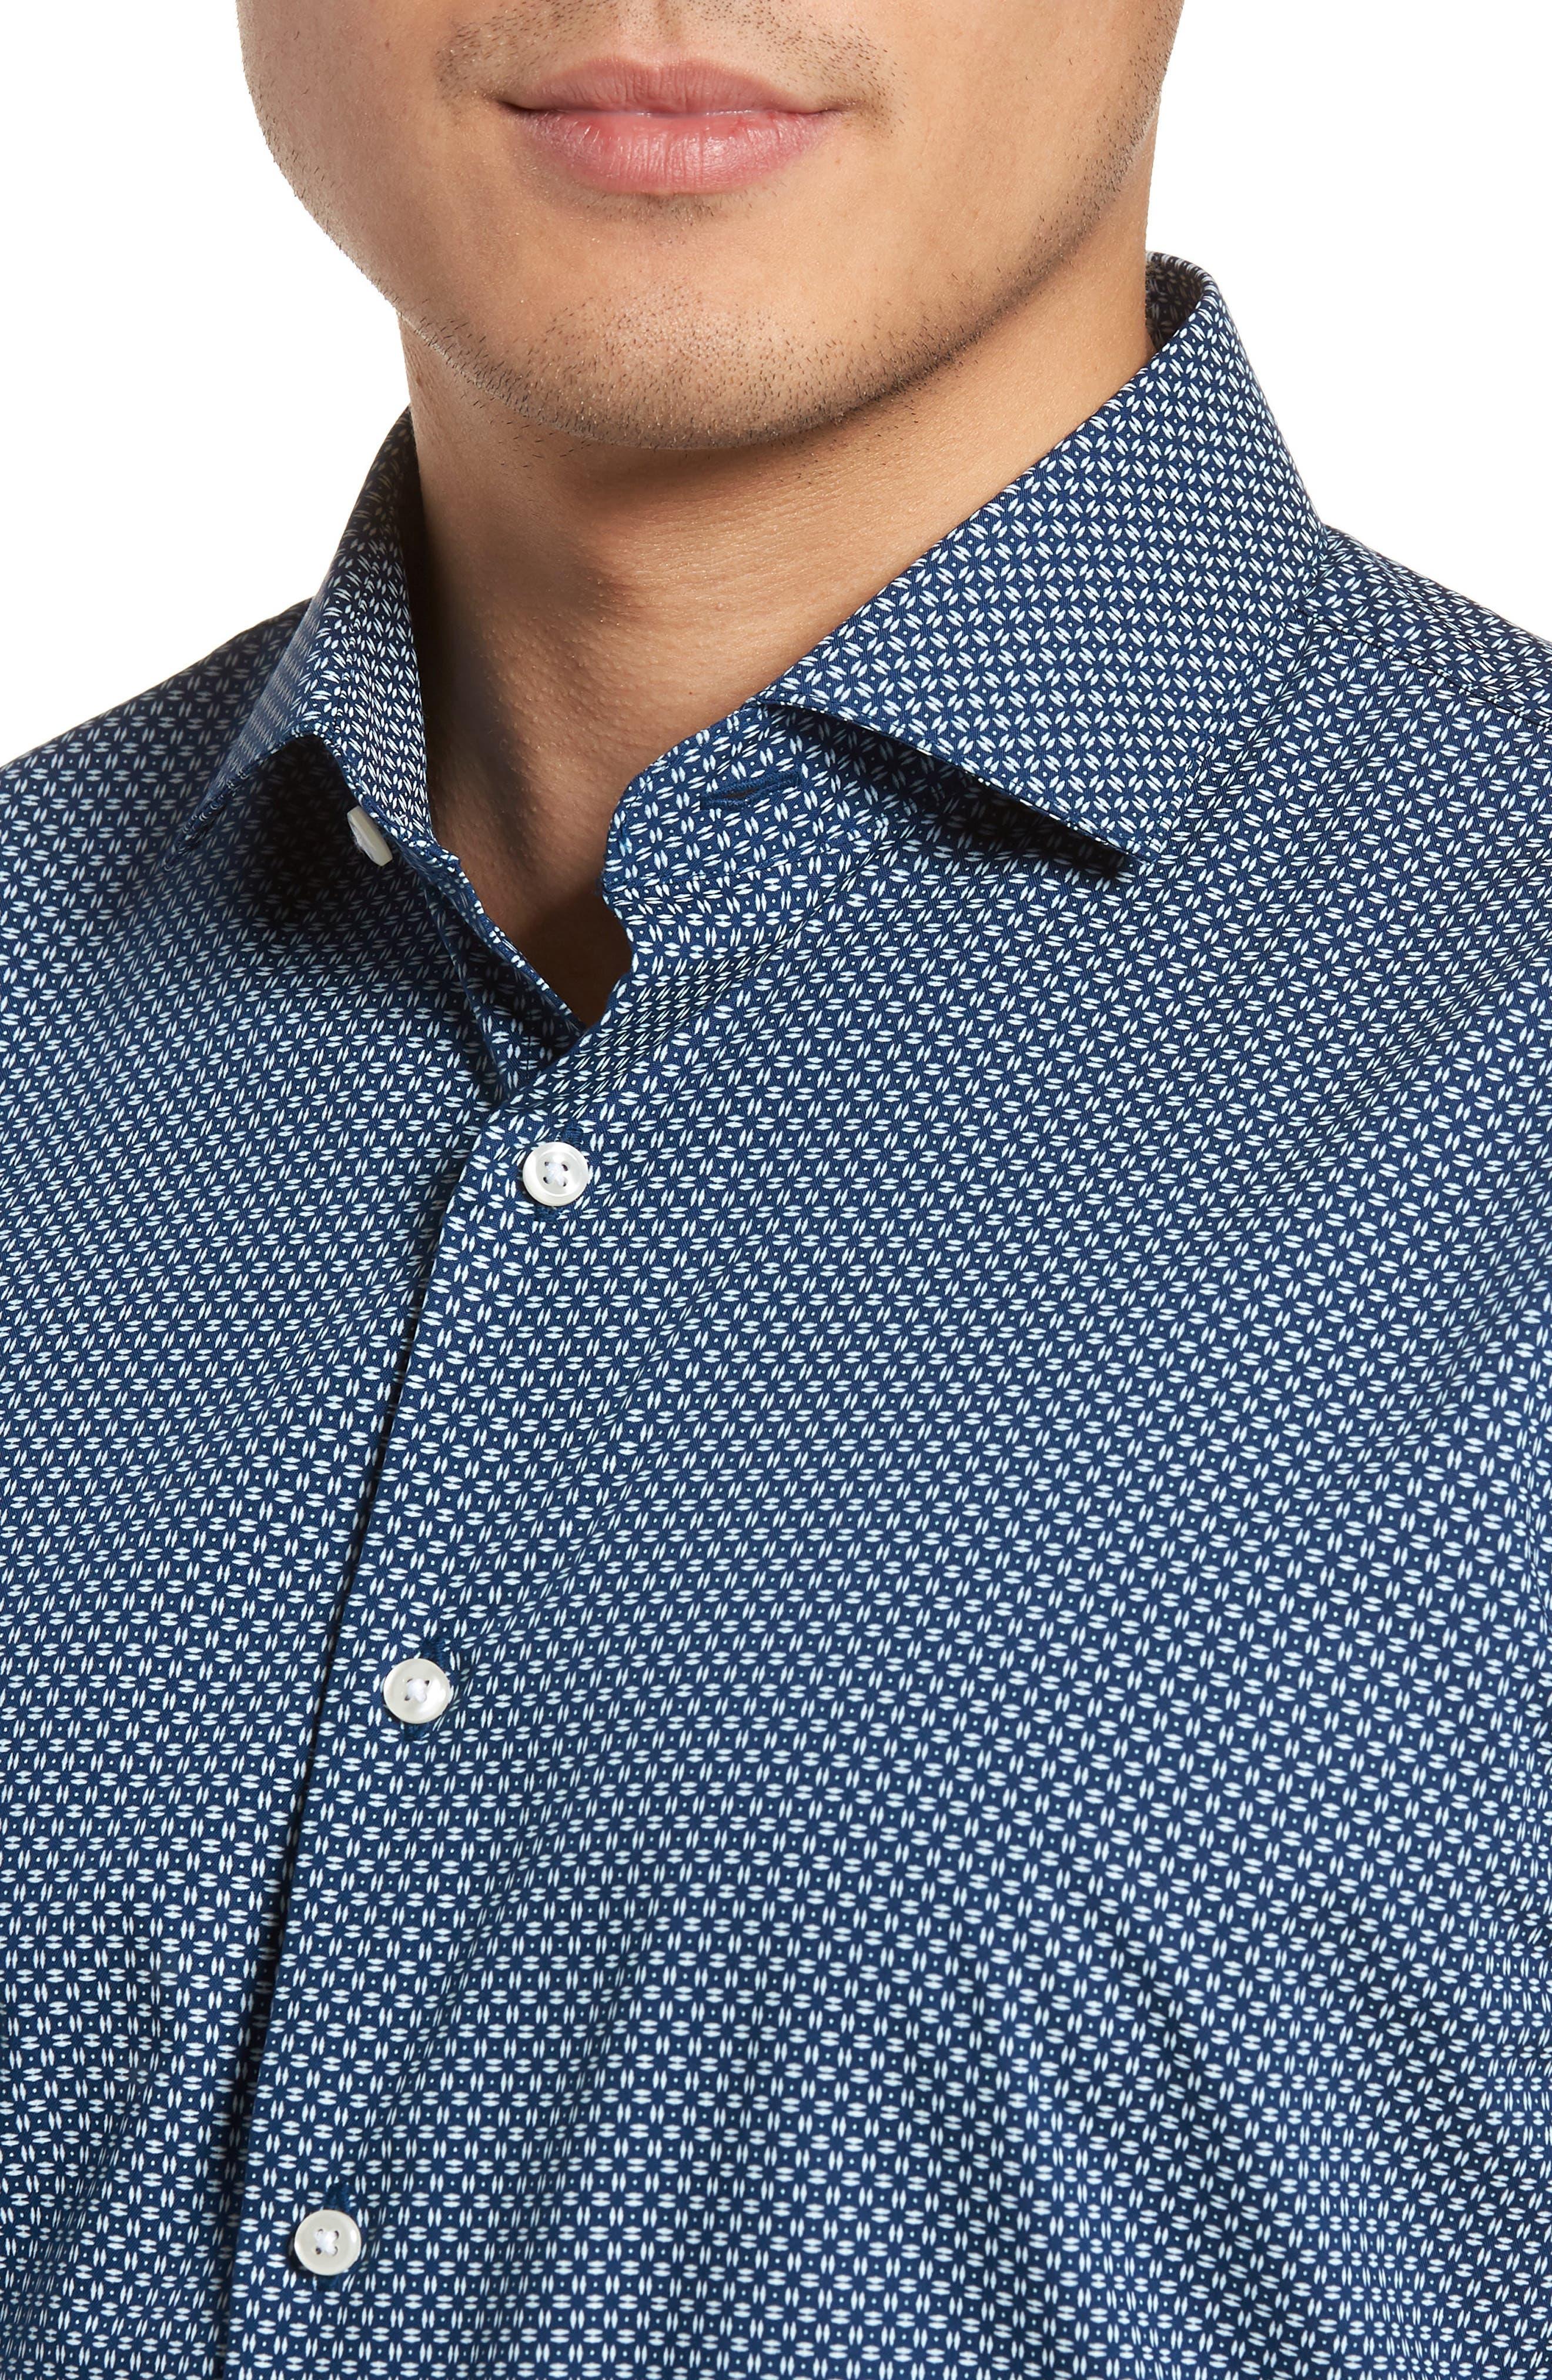 Trim Fit Dress Shirt,                             Alternate thumbnail 2, color,                             Navy Night